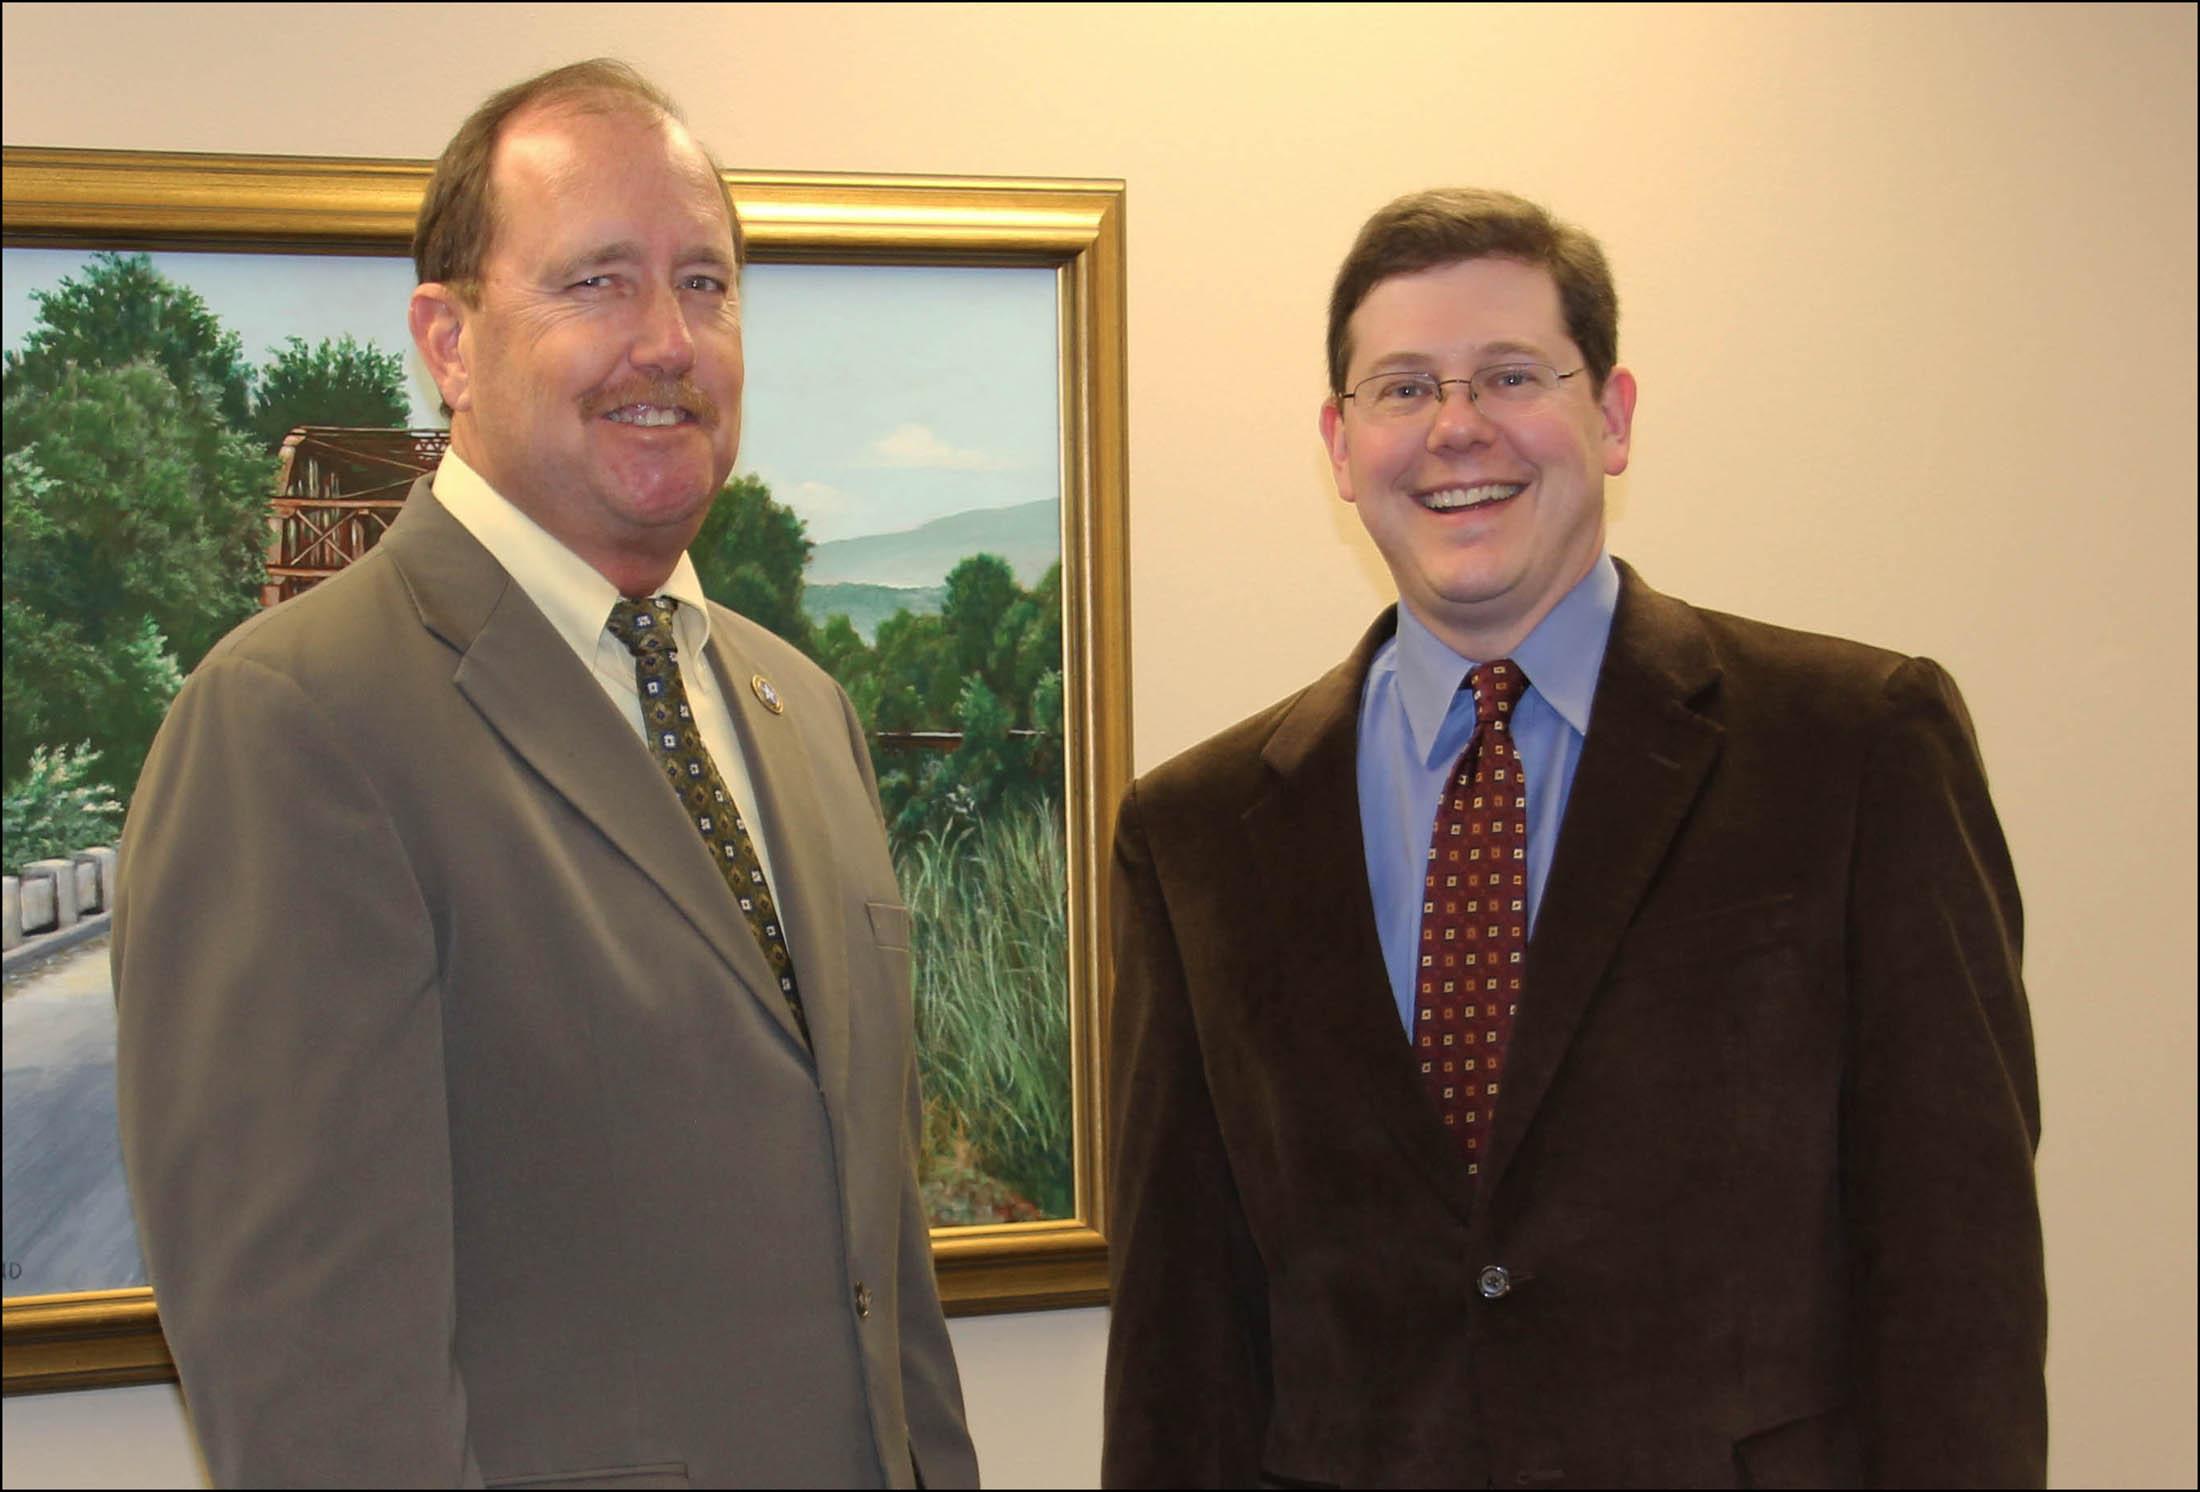 Mayor Shockley and President Webb